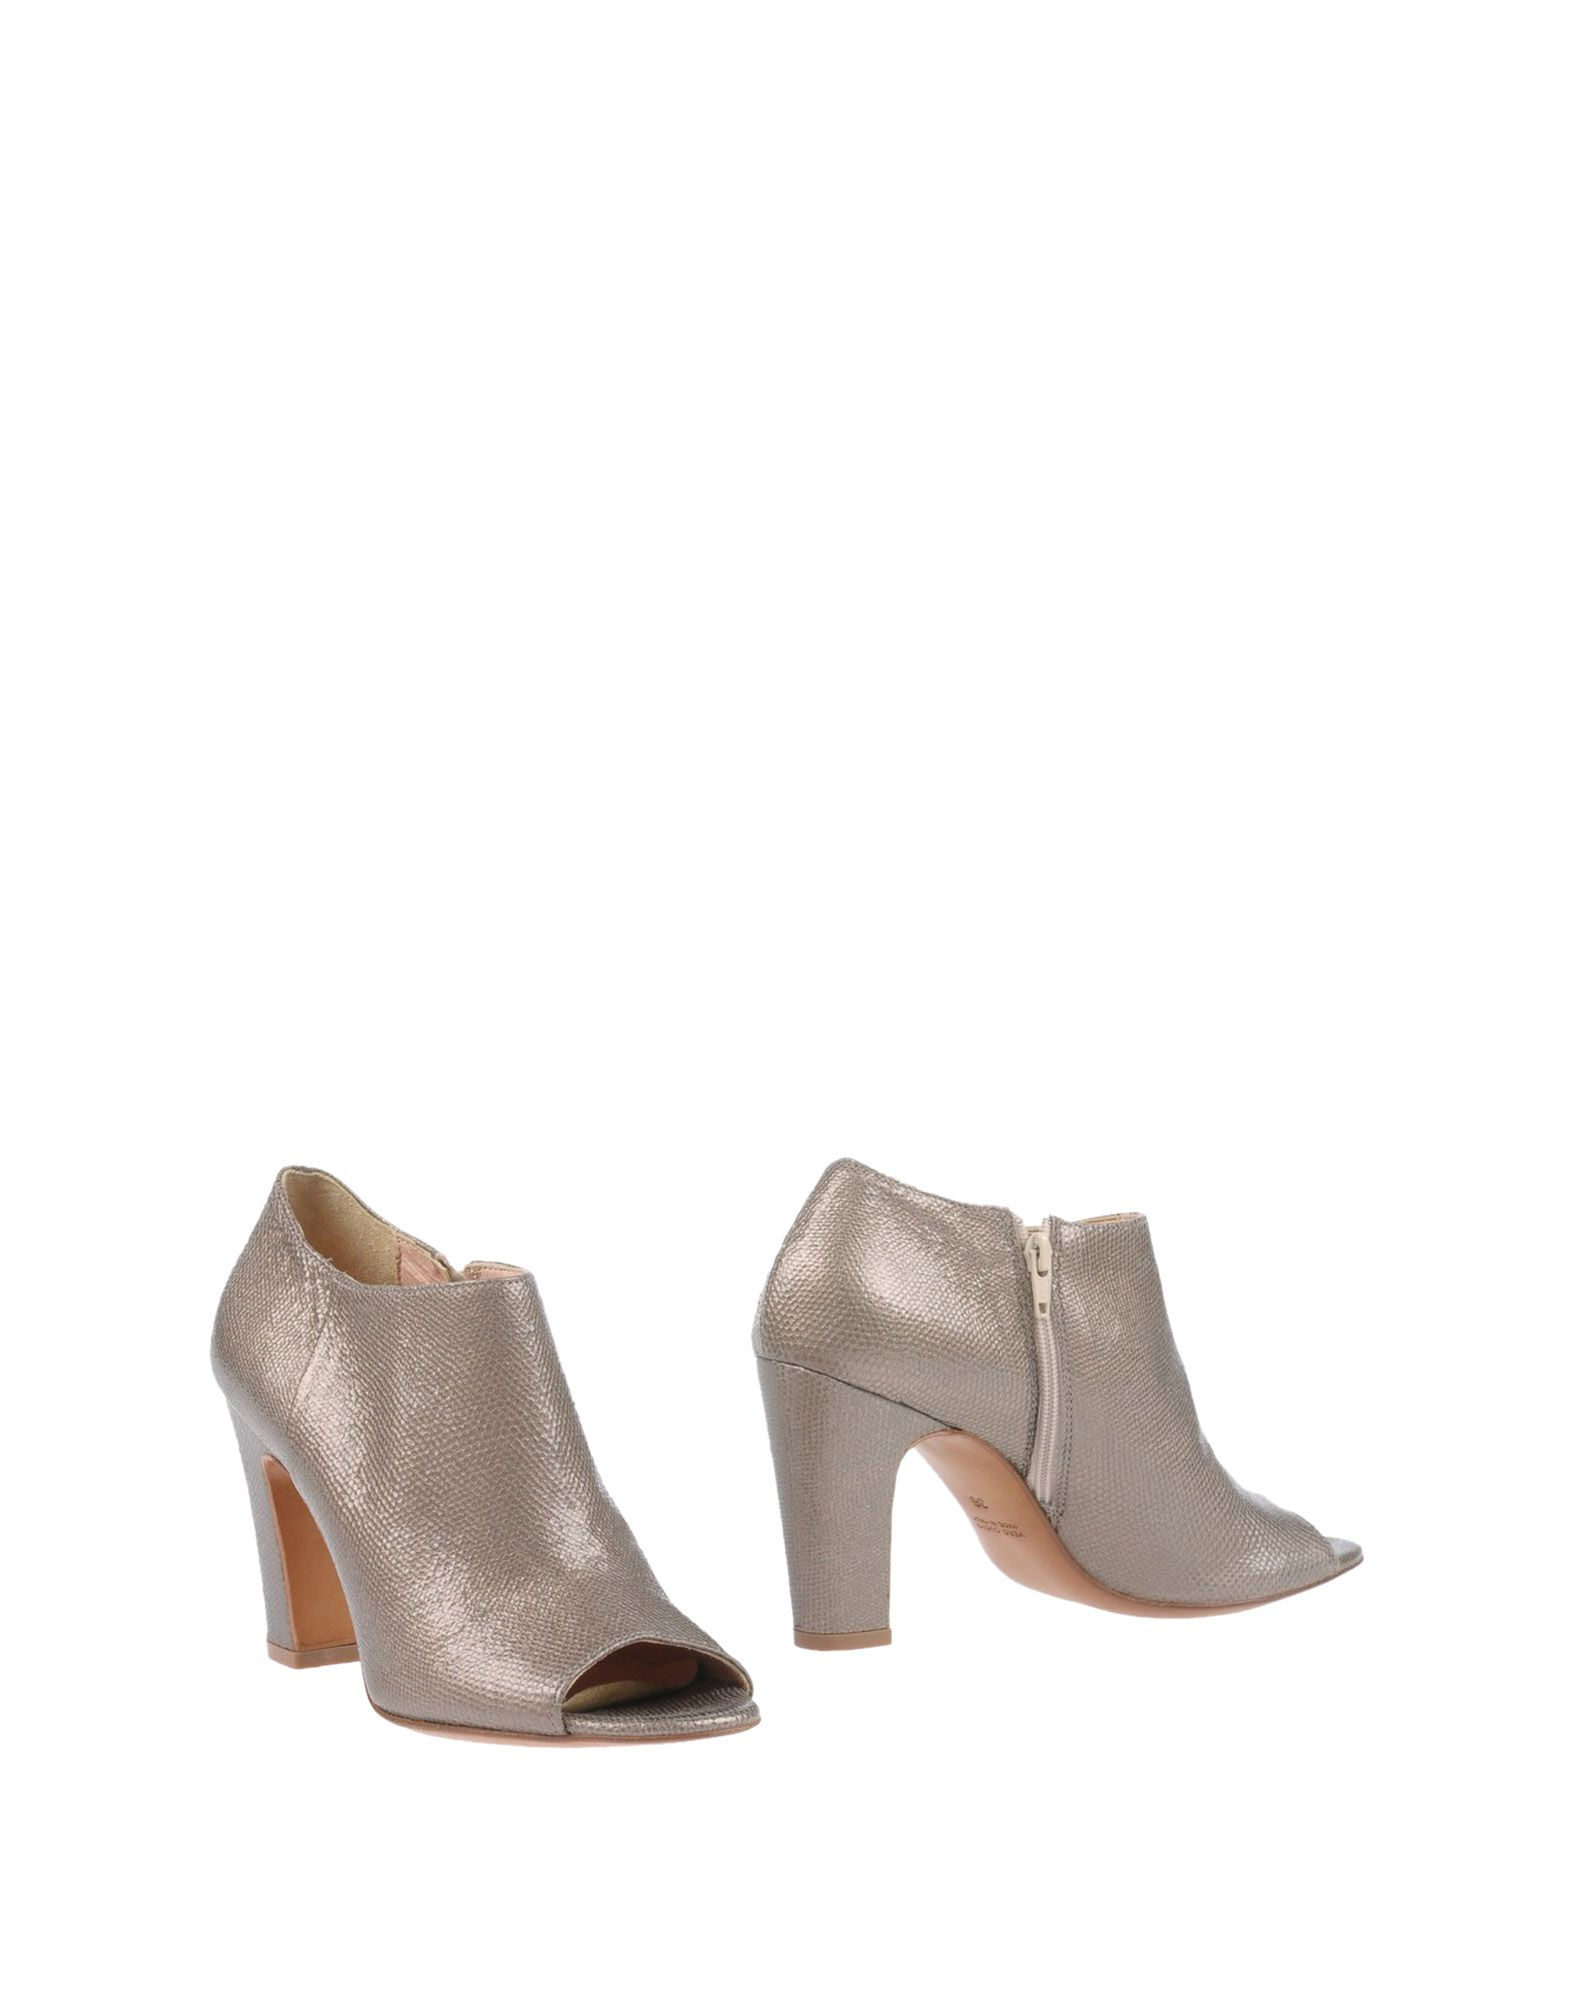 Chiarini Bologna Stiefelette Damen  11126362MH Neue Schuhe Schuhe Schuhe f2e973